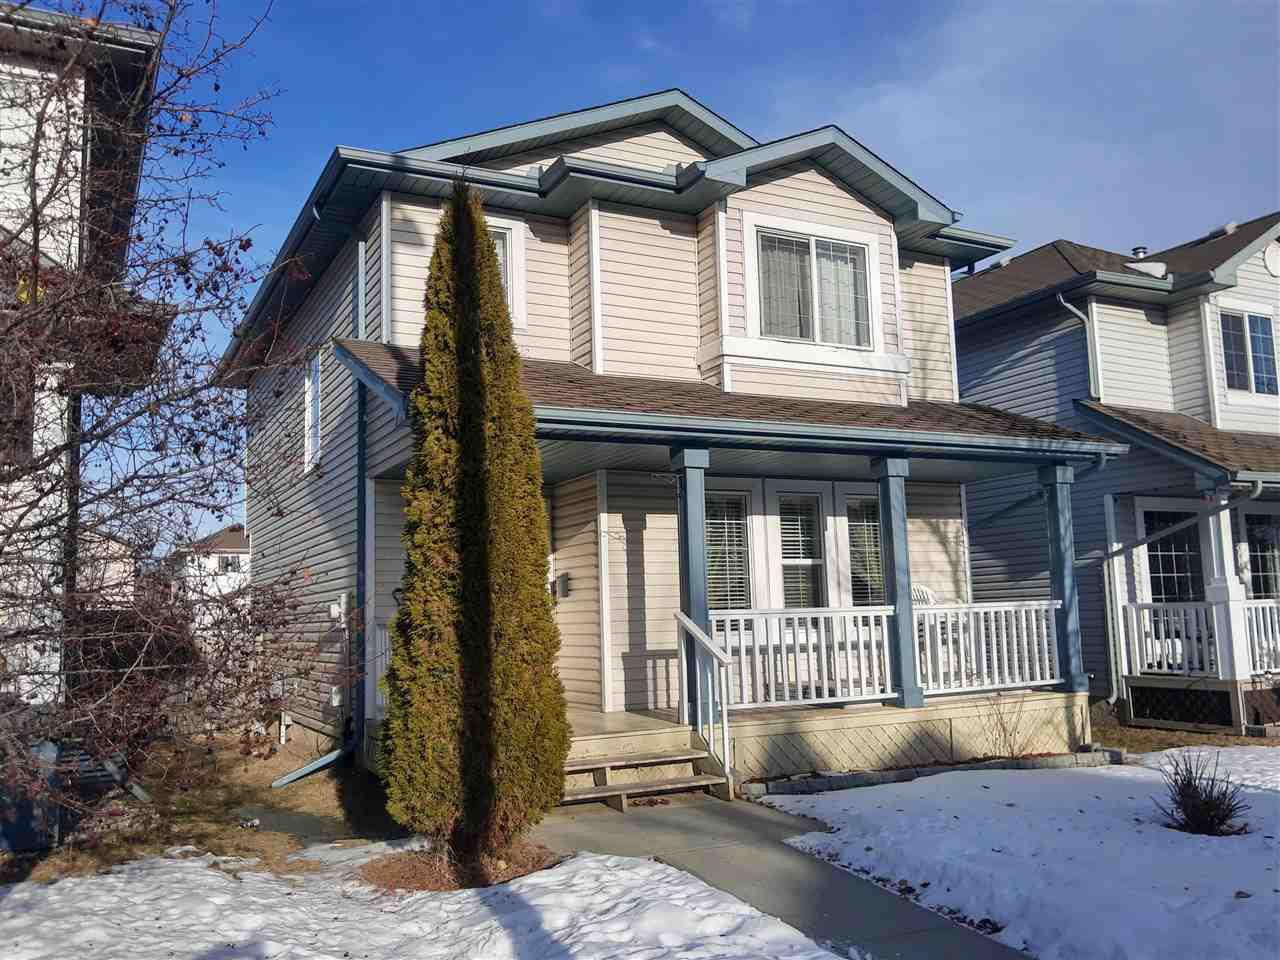 Main Photo: 20130 53 Avenue in Edmonton: Zone 58 House for sale : MLS®# E4224839